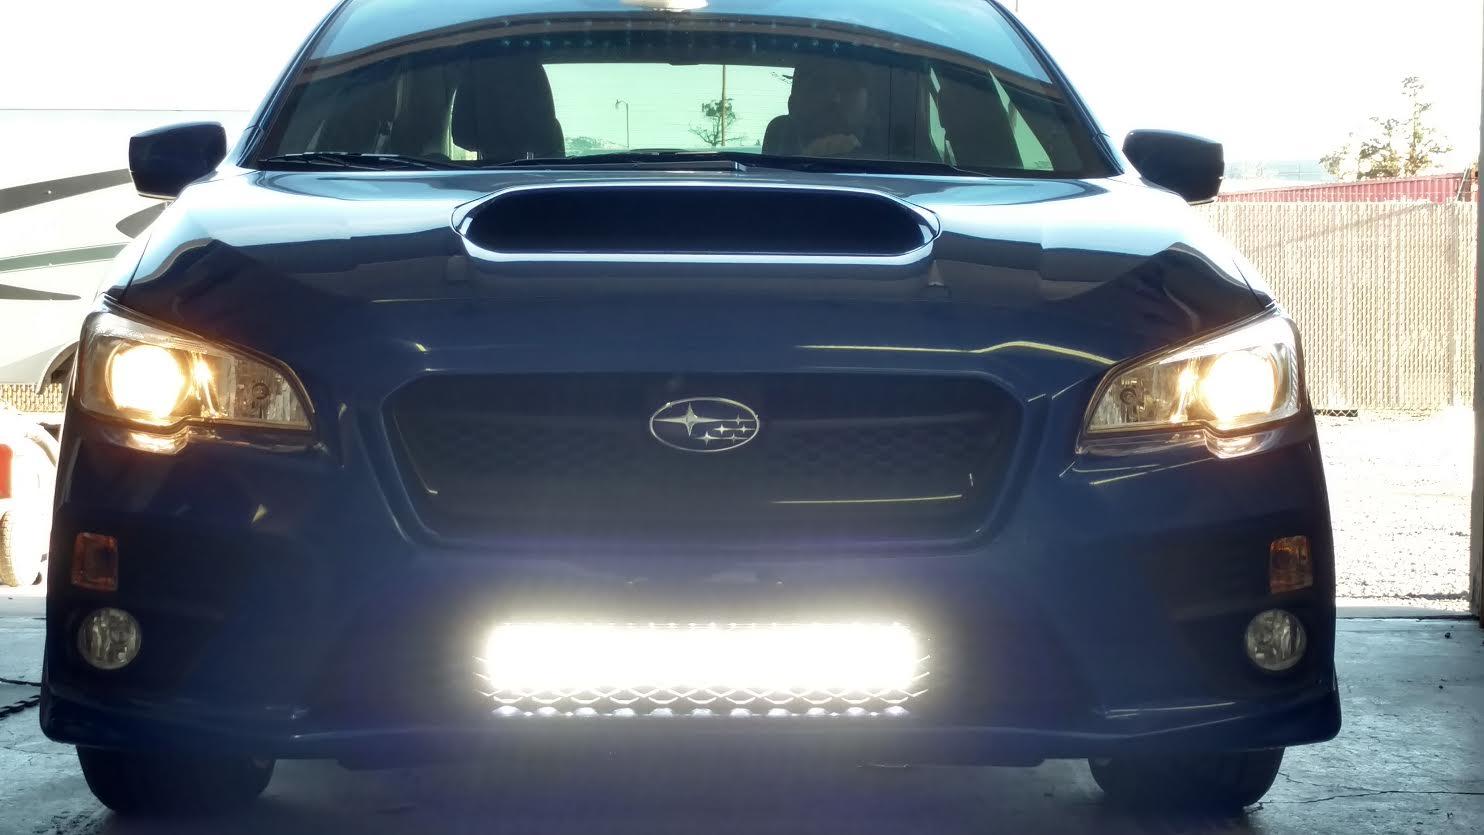 sti-bumper-light-on.jpg